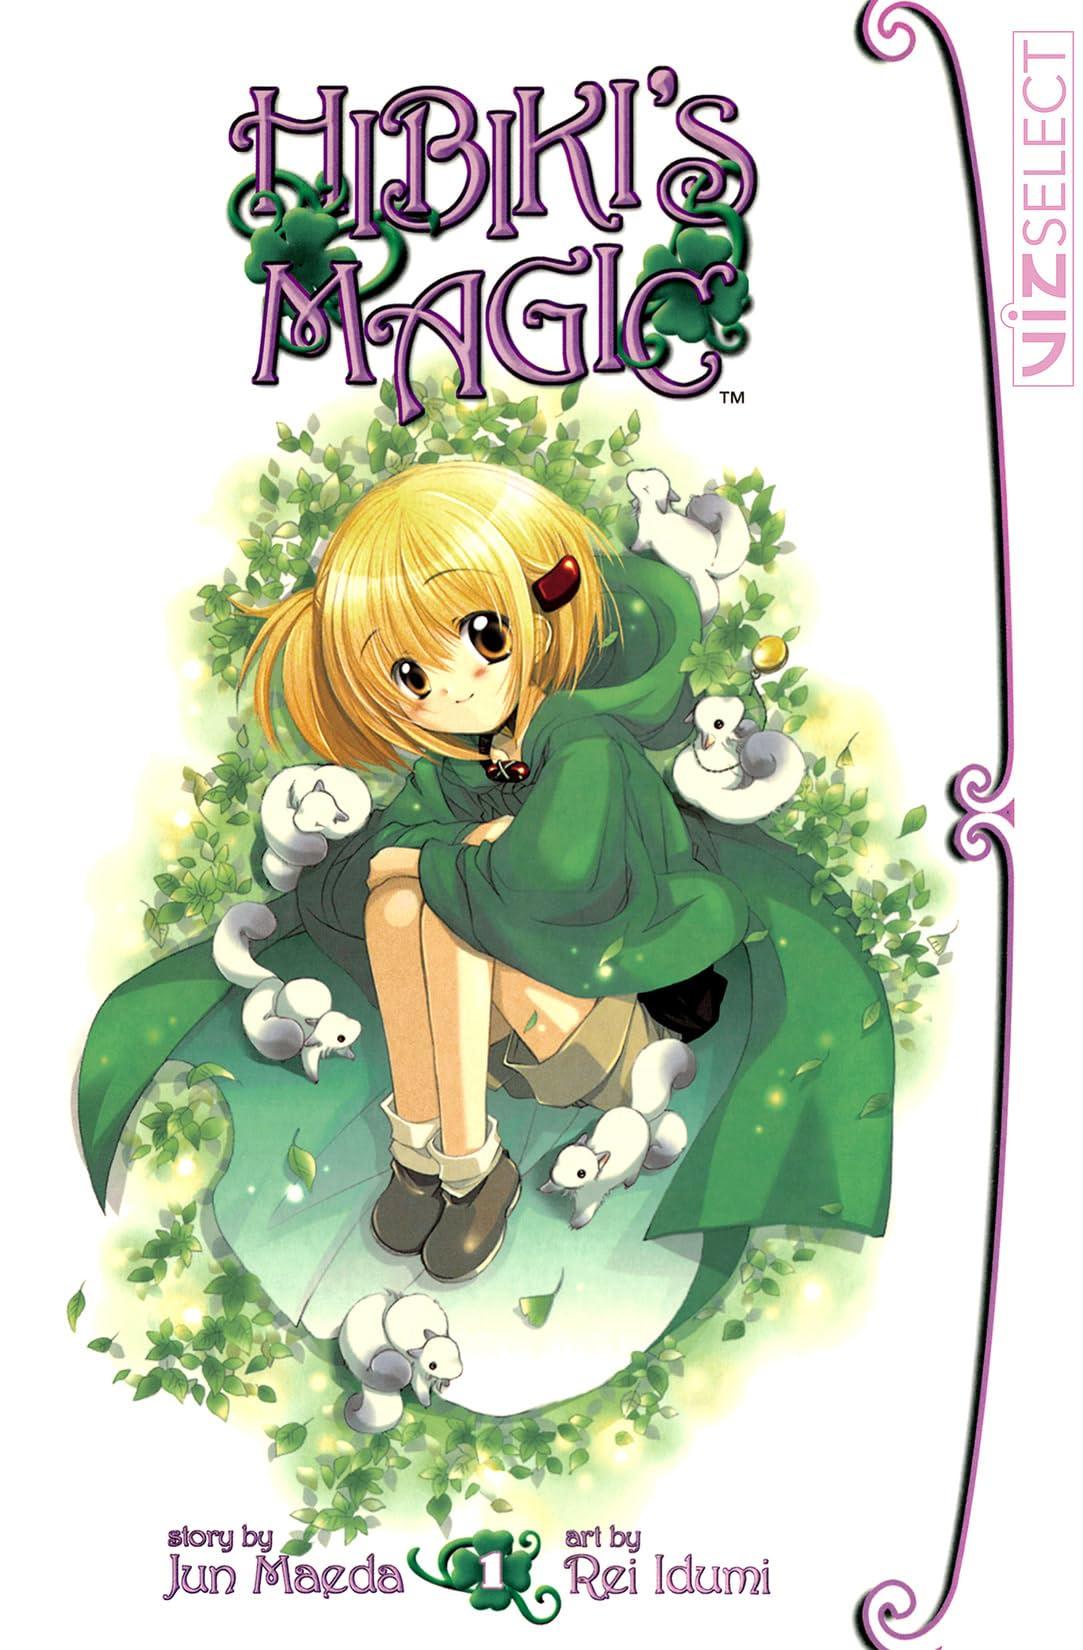 Hibiki's Magic Vol. 1